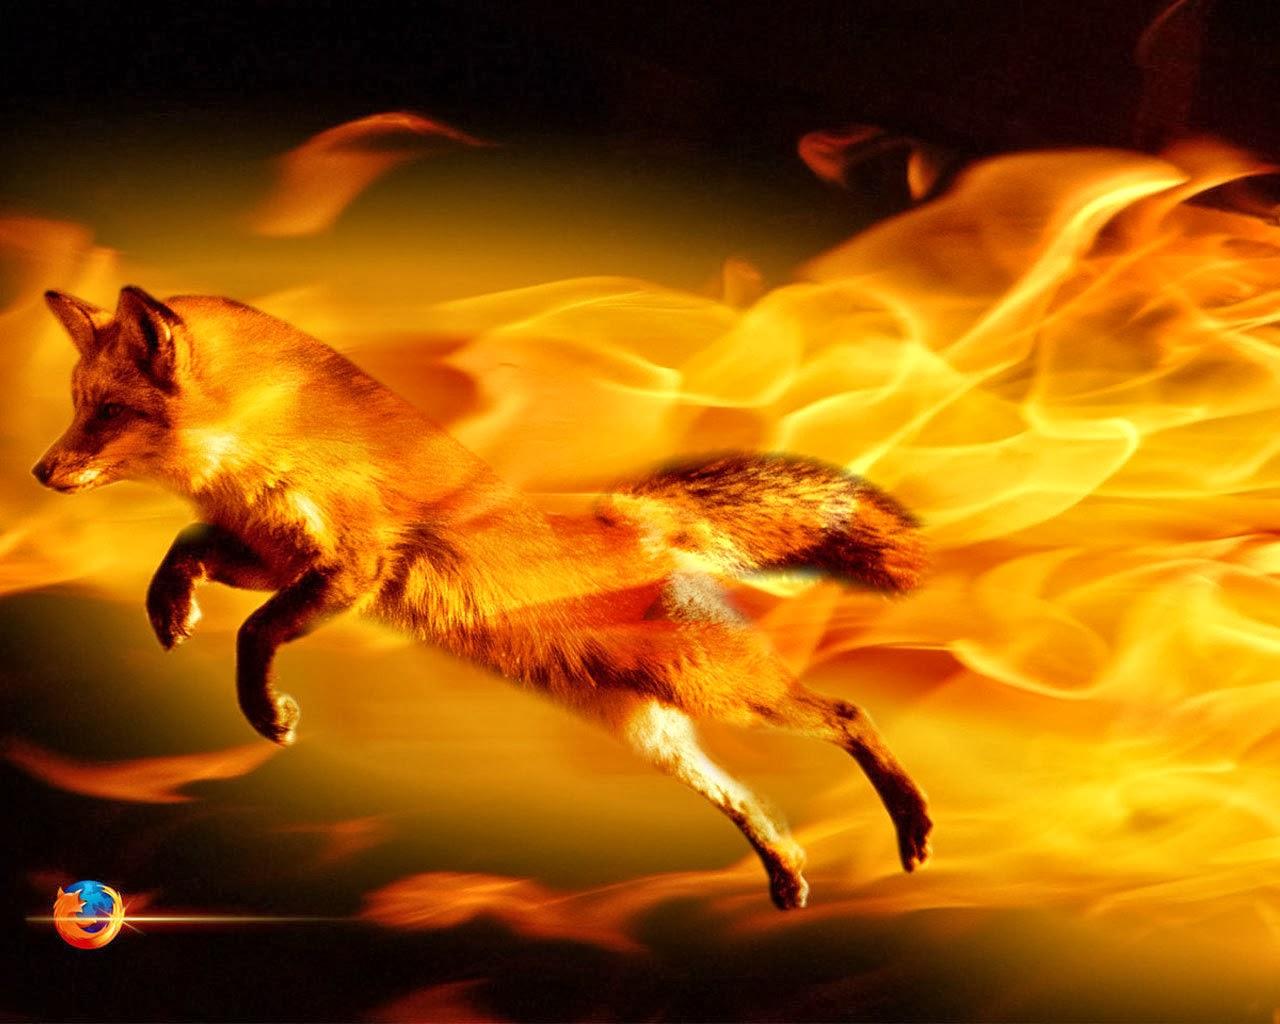 best fire wallpaper background - photo #35